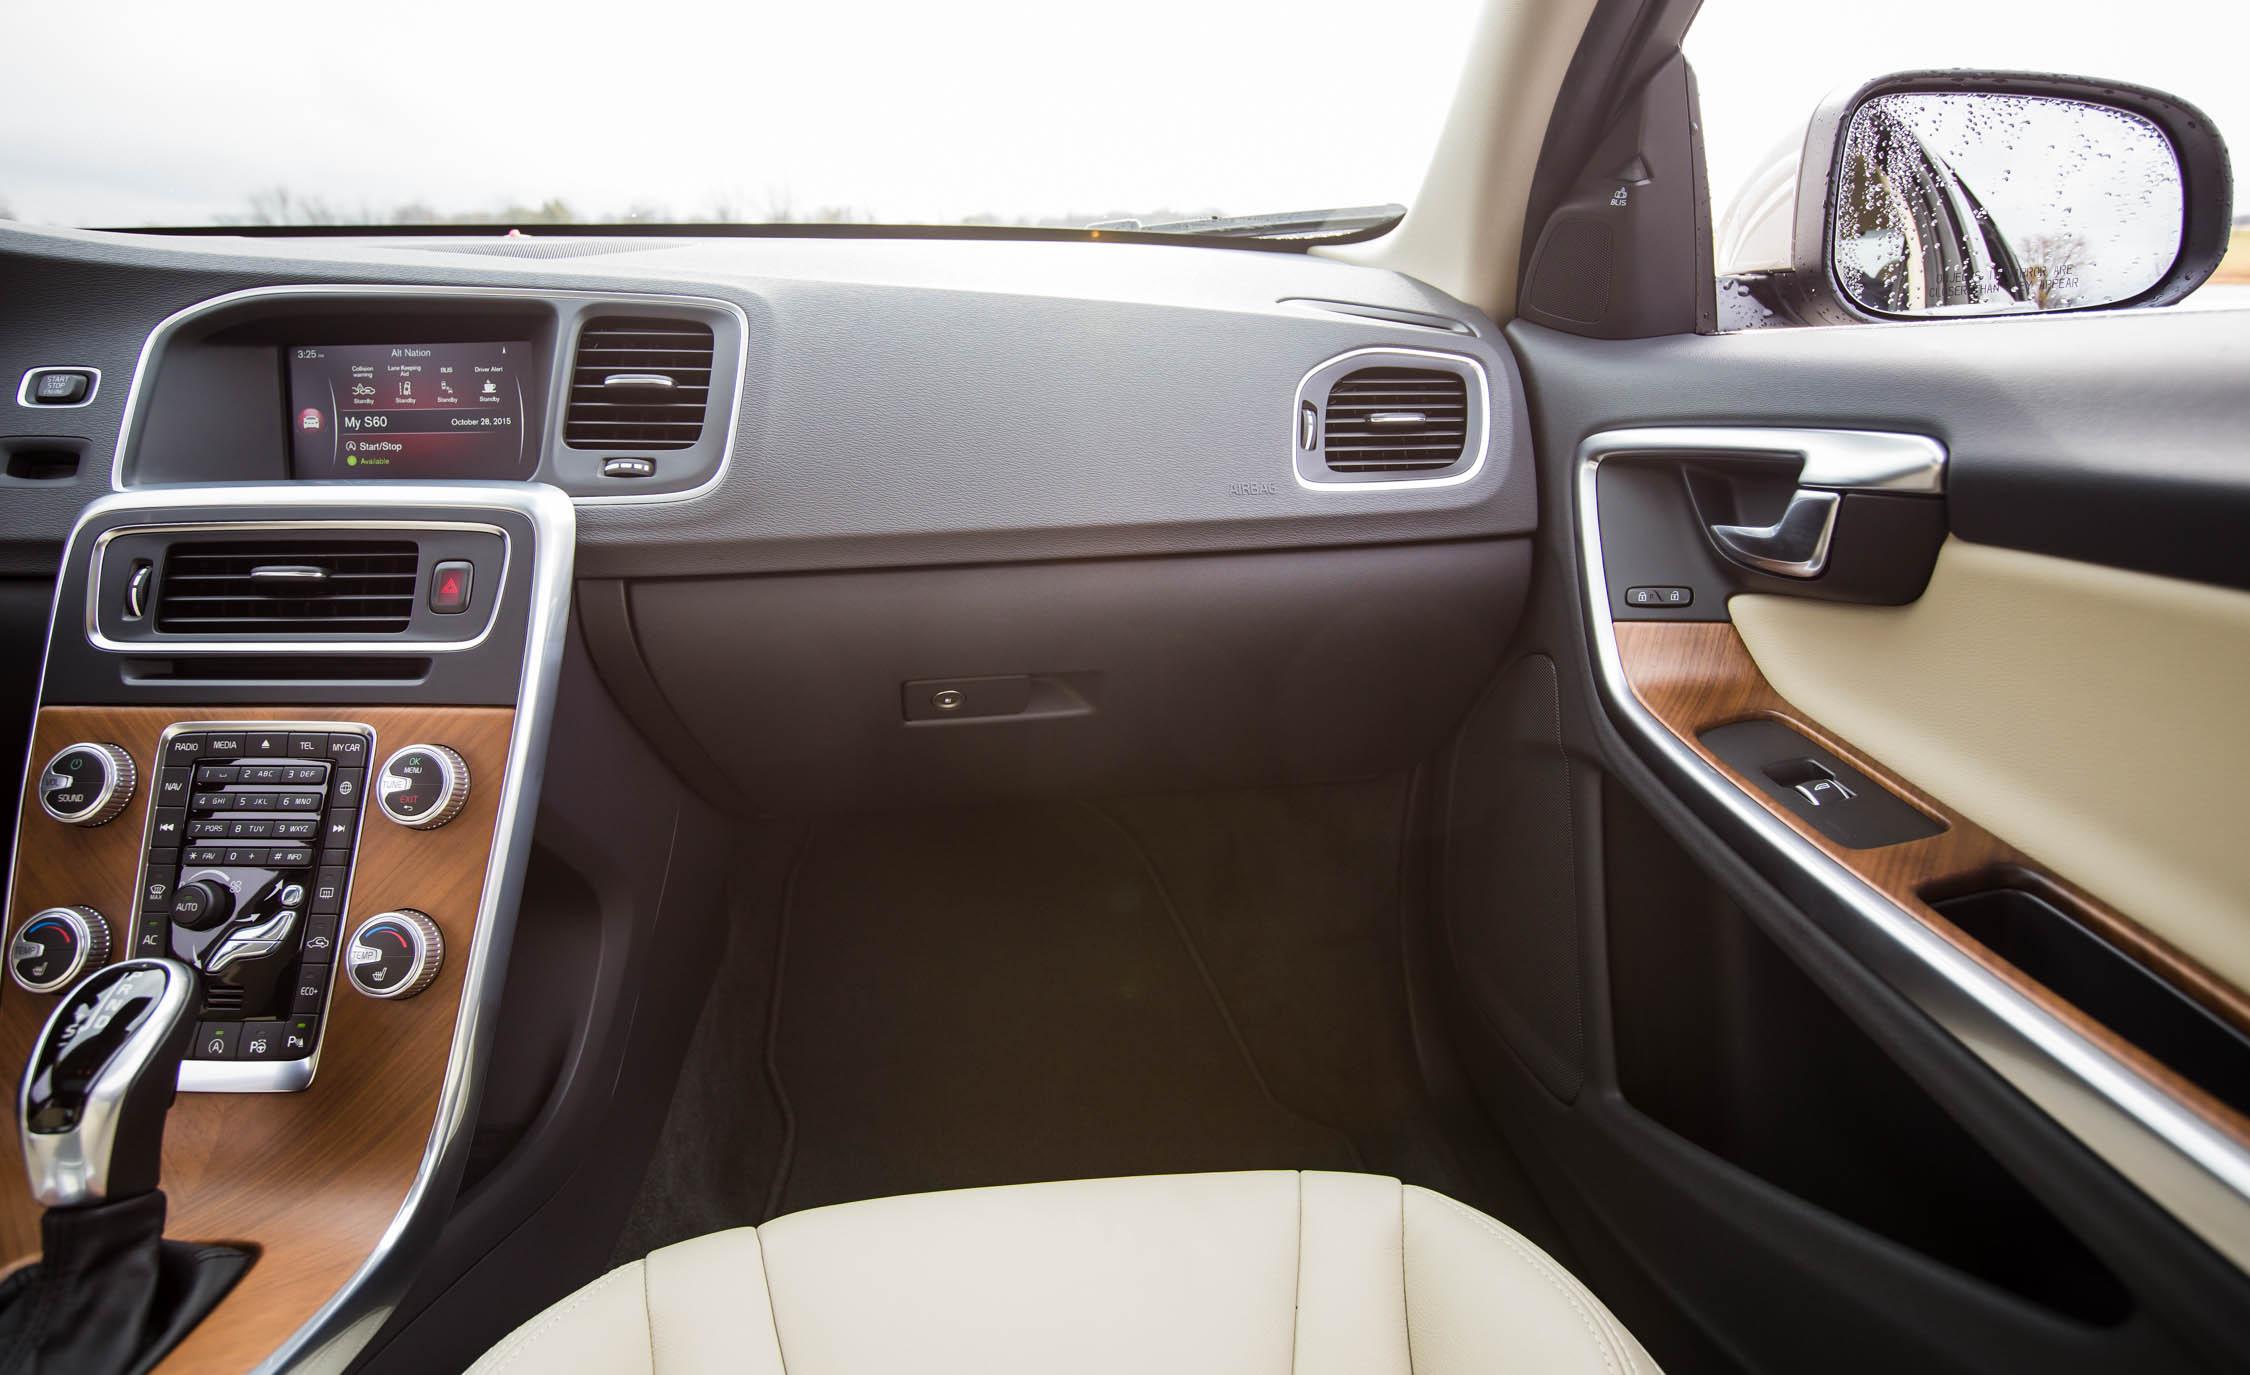 2016 Volvo S60 T5 Inscription Interior Front Passenger Dash